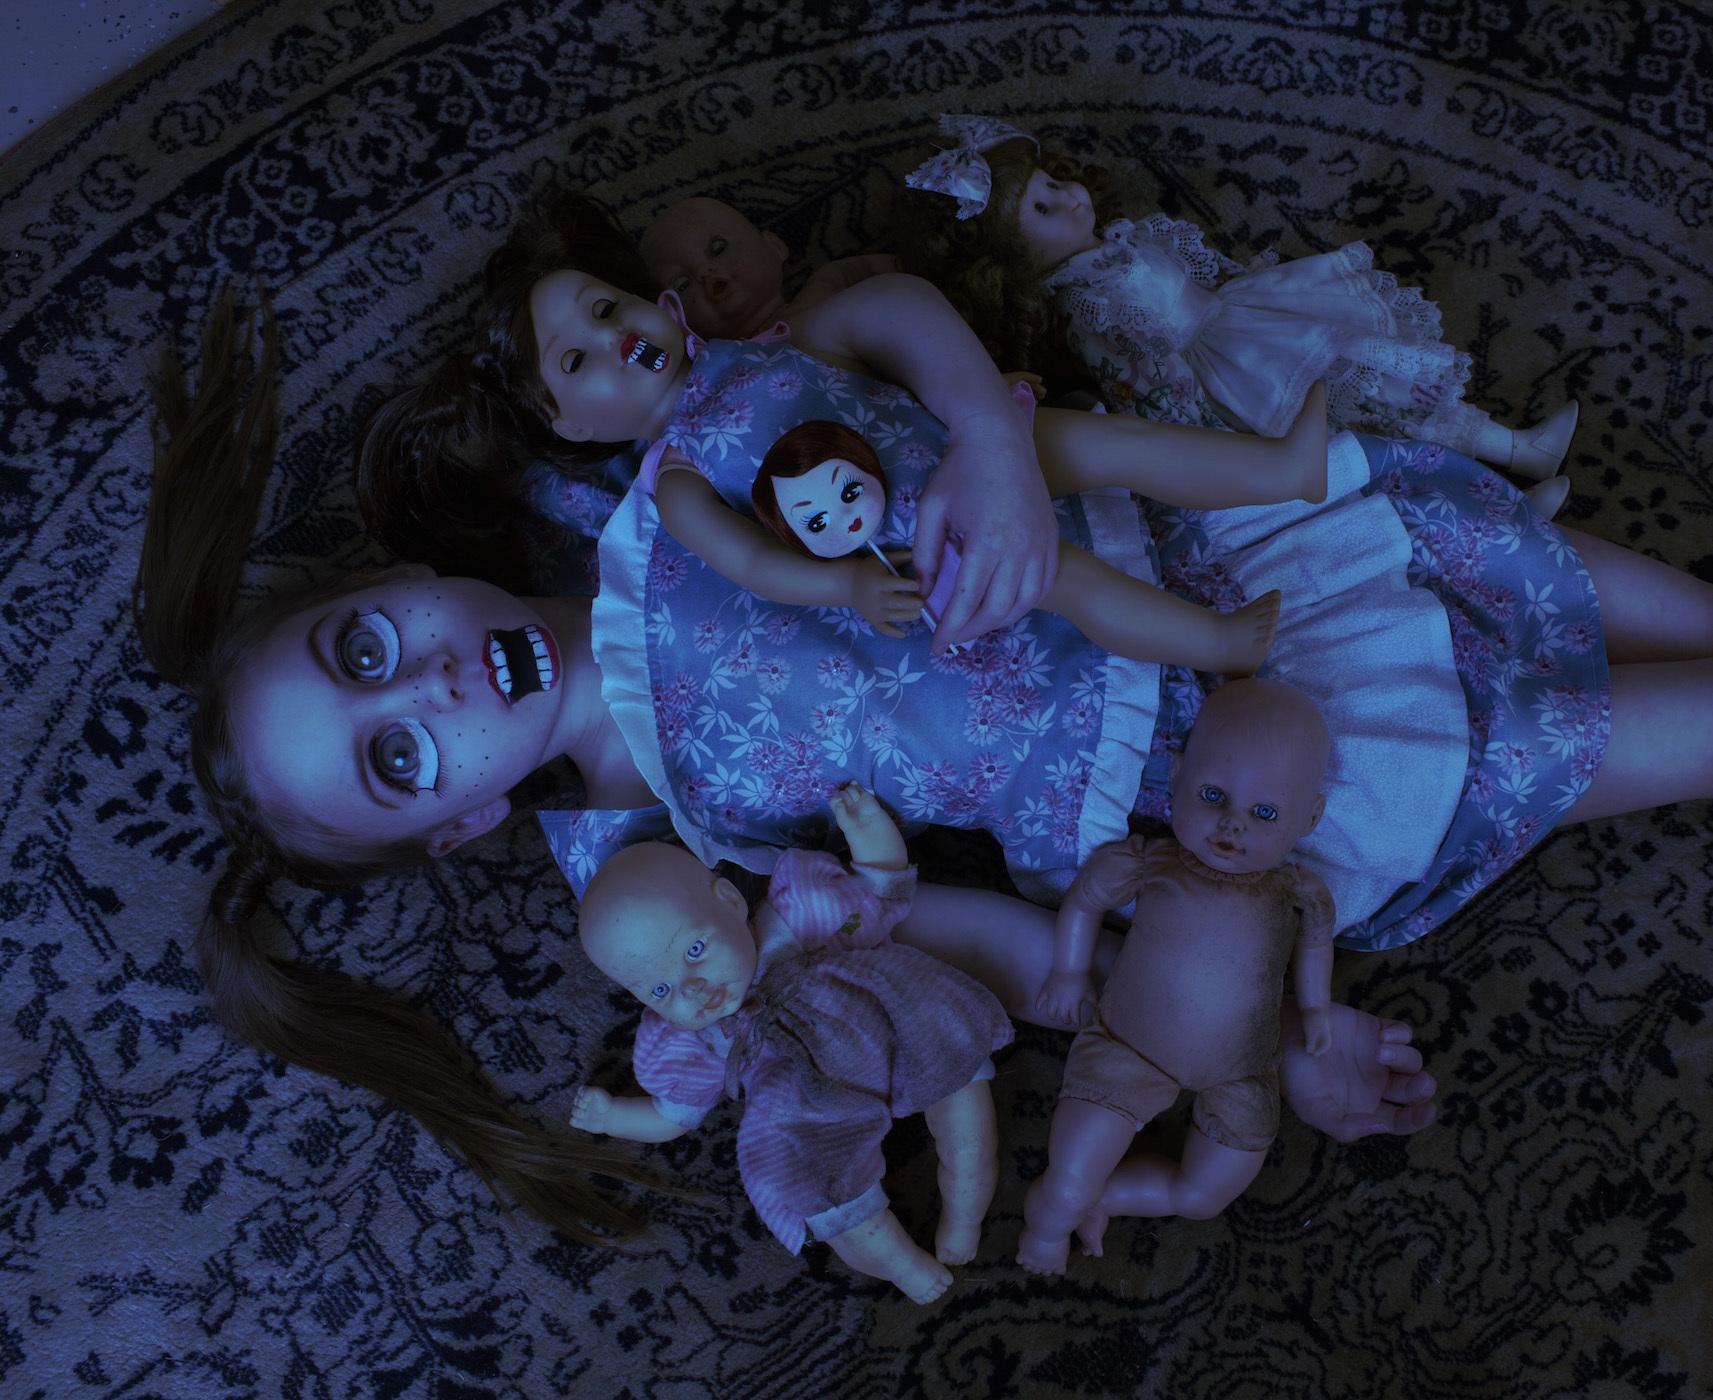 photographs-of-child-zombies-601-body-image-1433189232.jpg